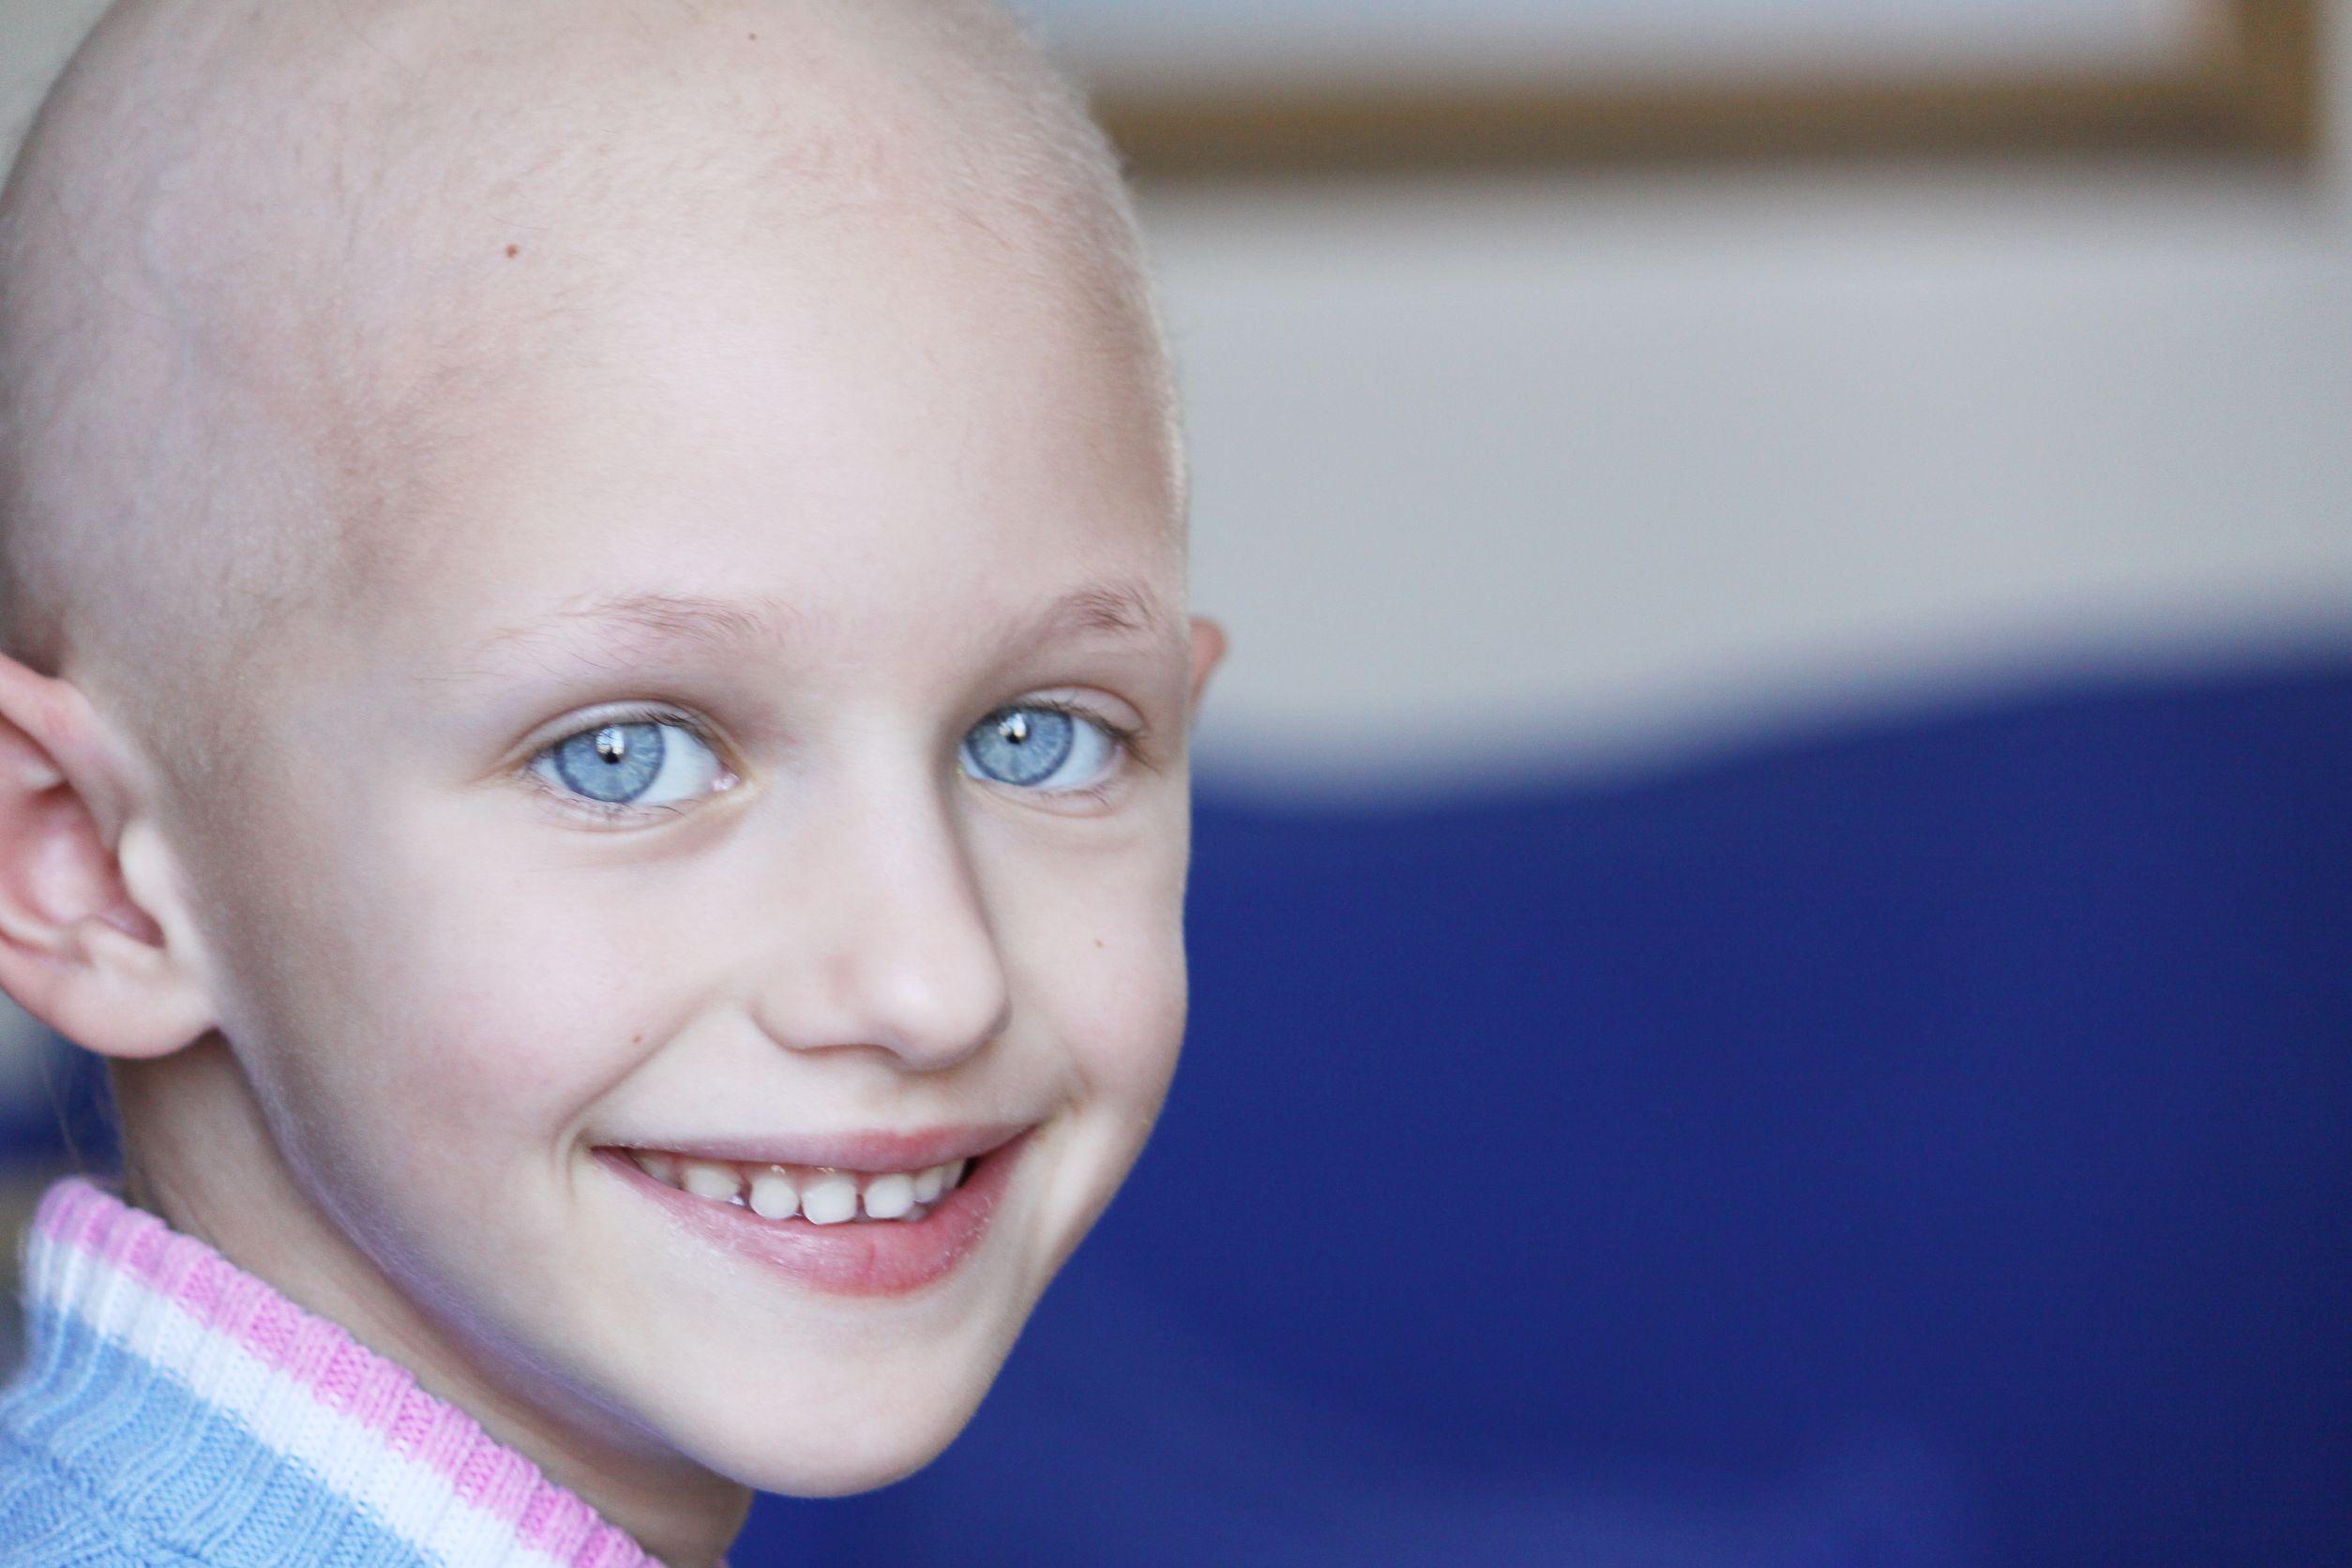 neuroblastoma in children